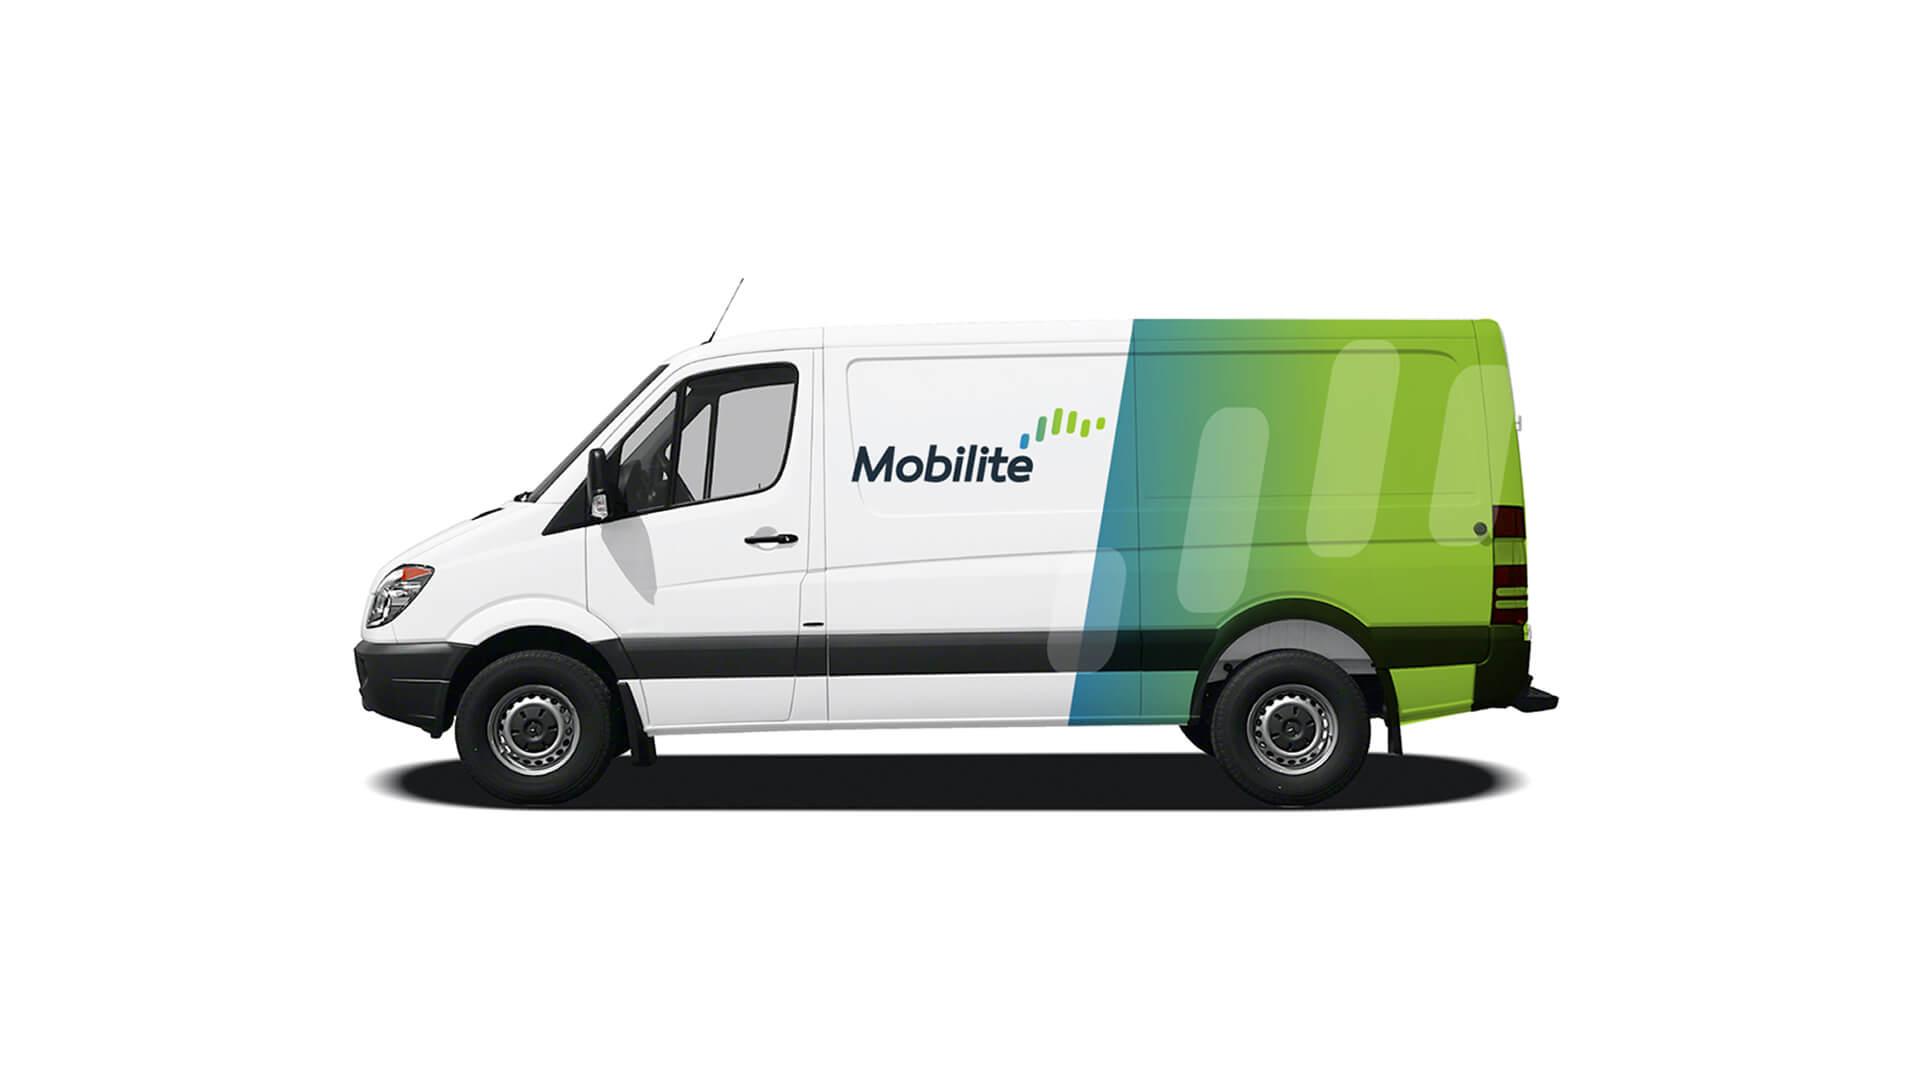 mobilite-car2